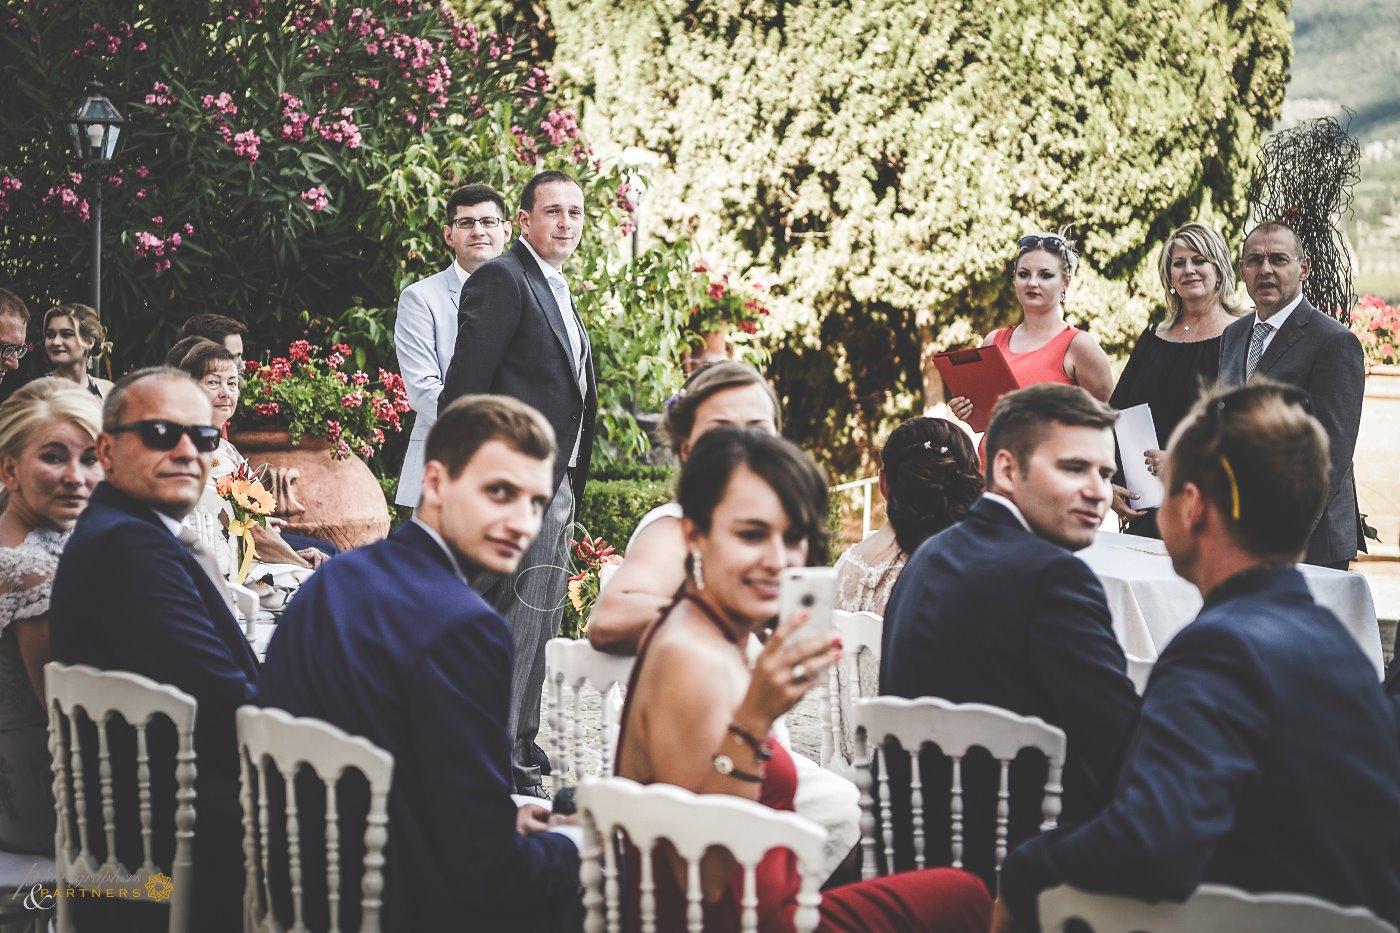 photography_weddings_vicchiomaggio_08.jpg